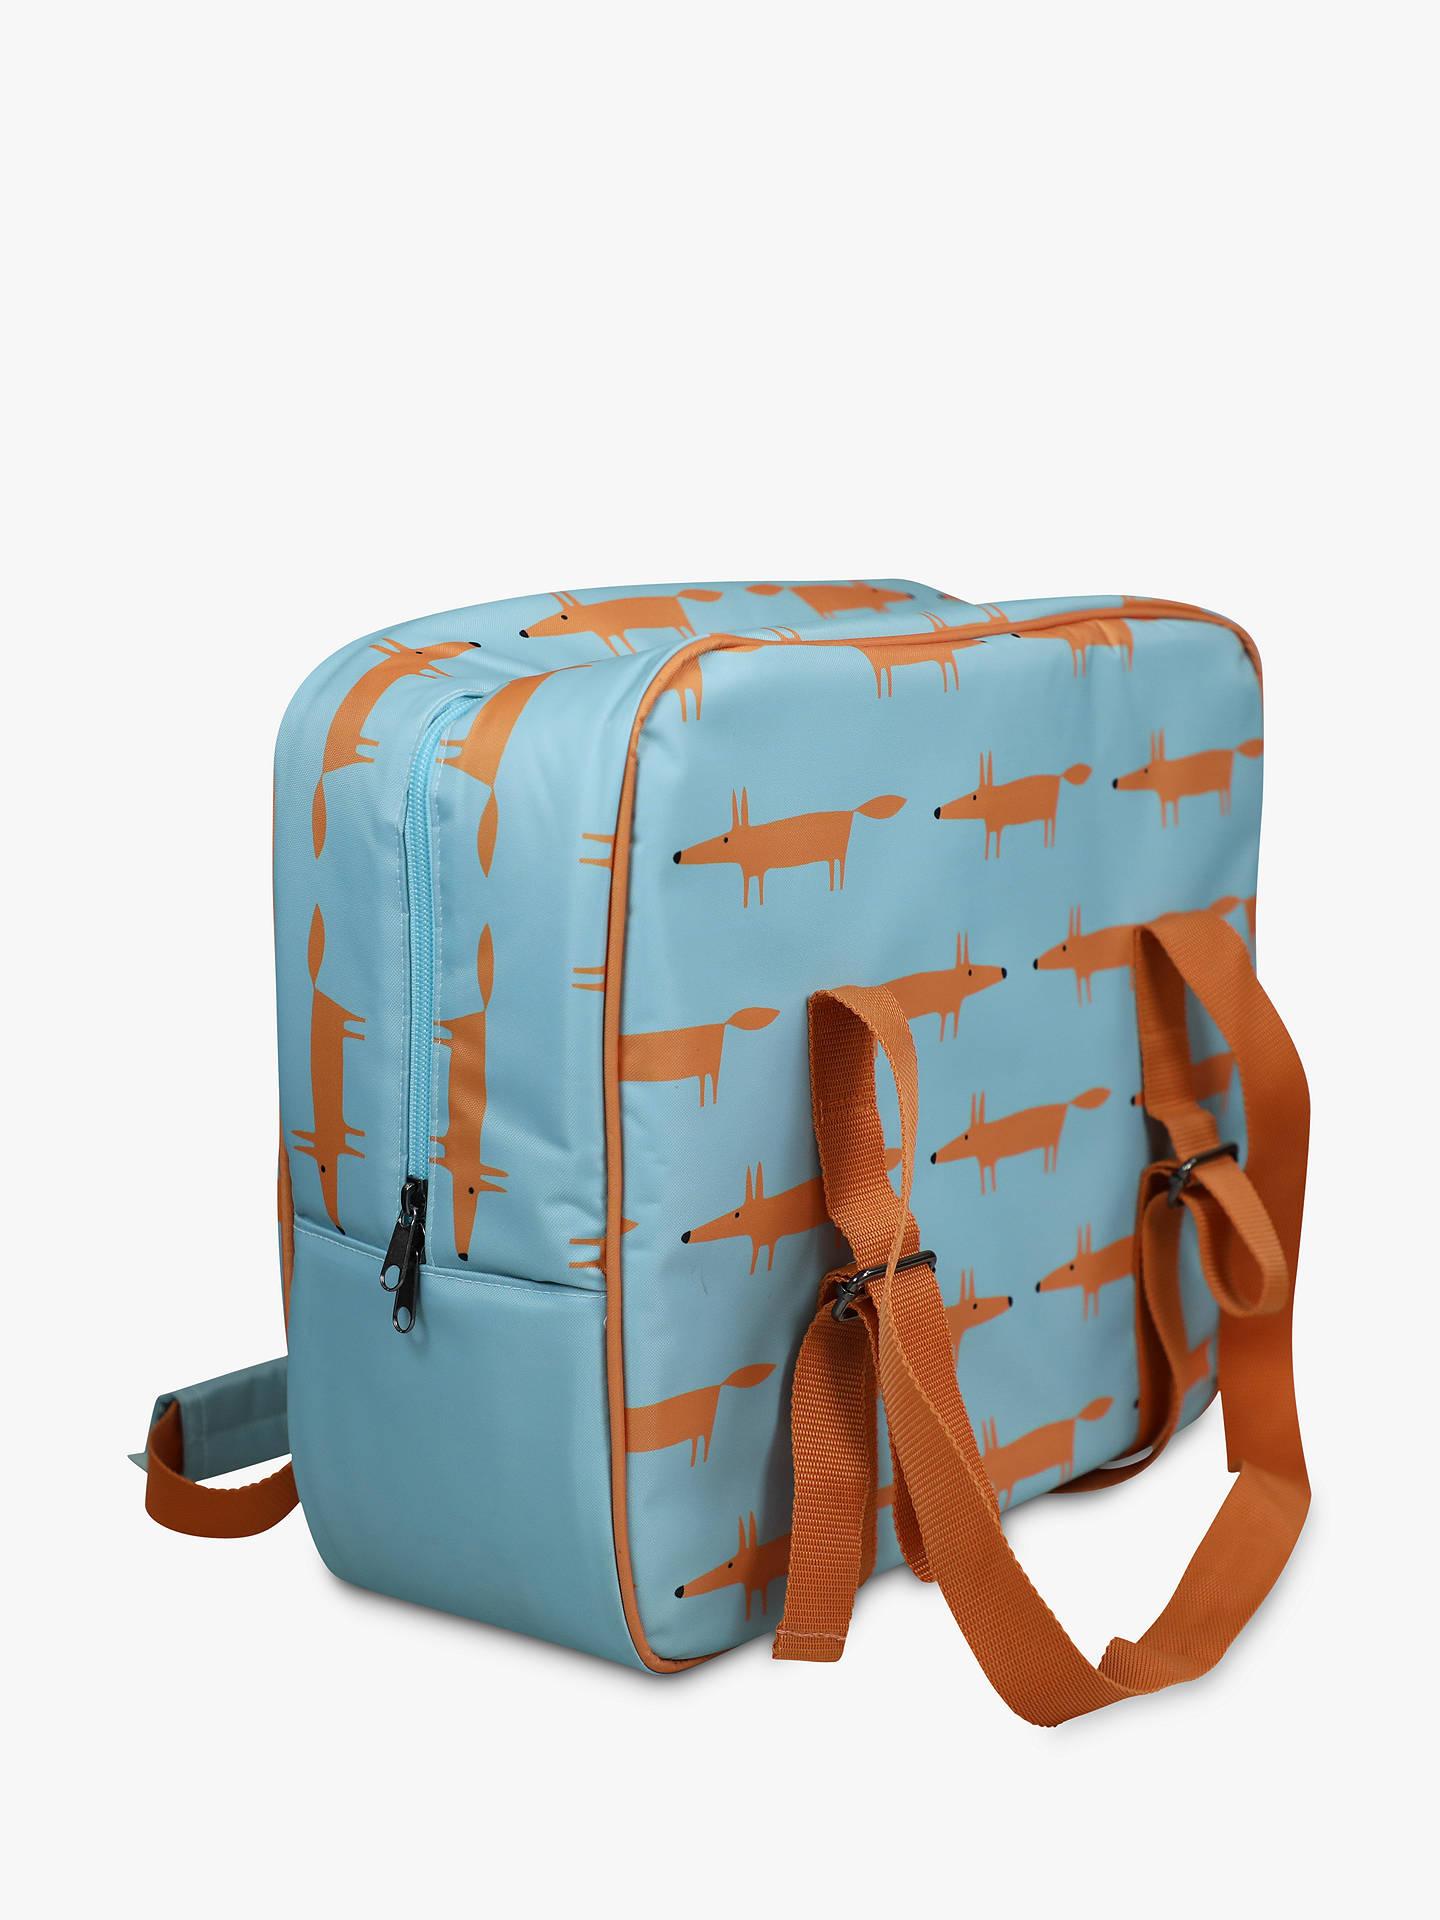 Scion Mr Fox Picnic Cooler Bag Blue